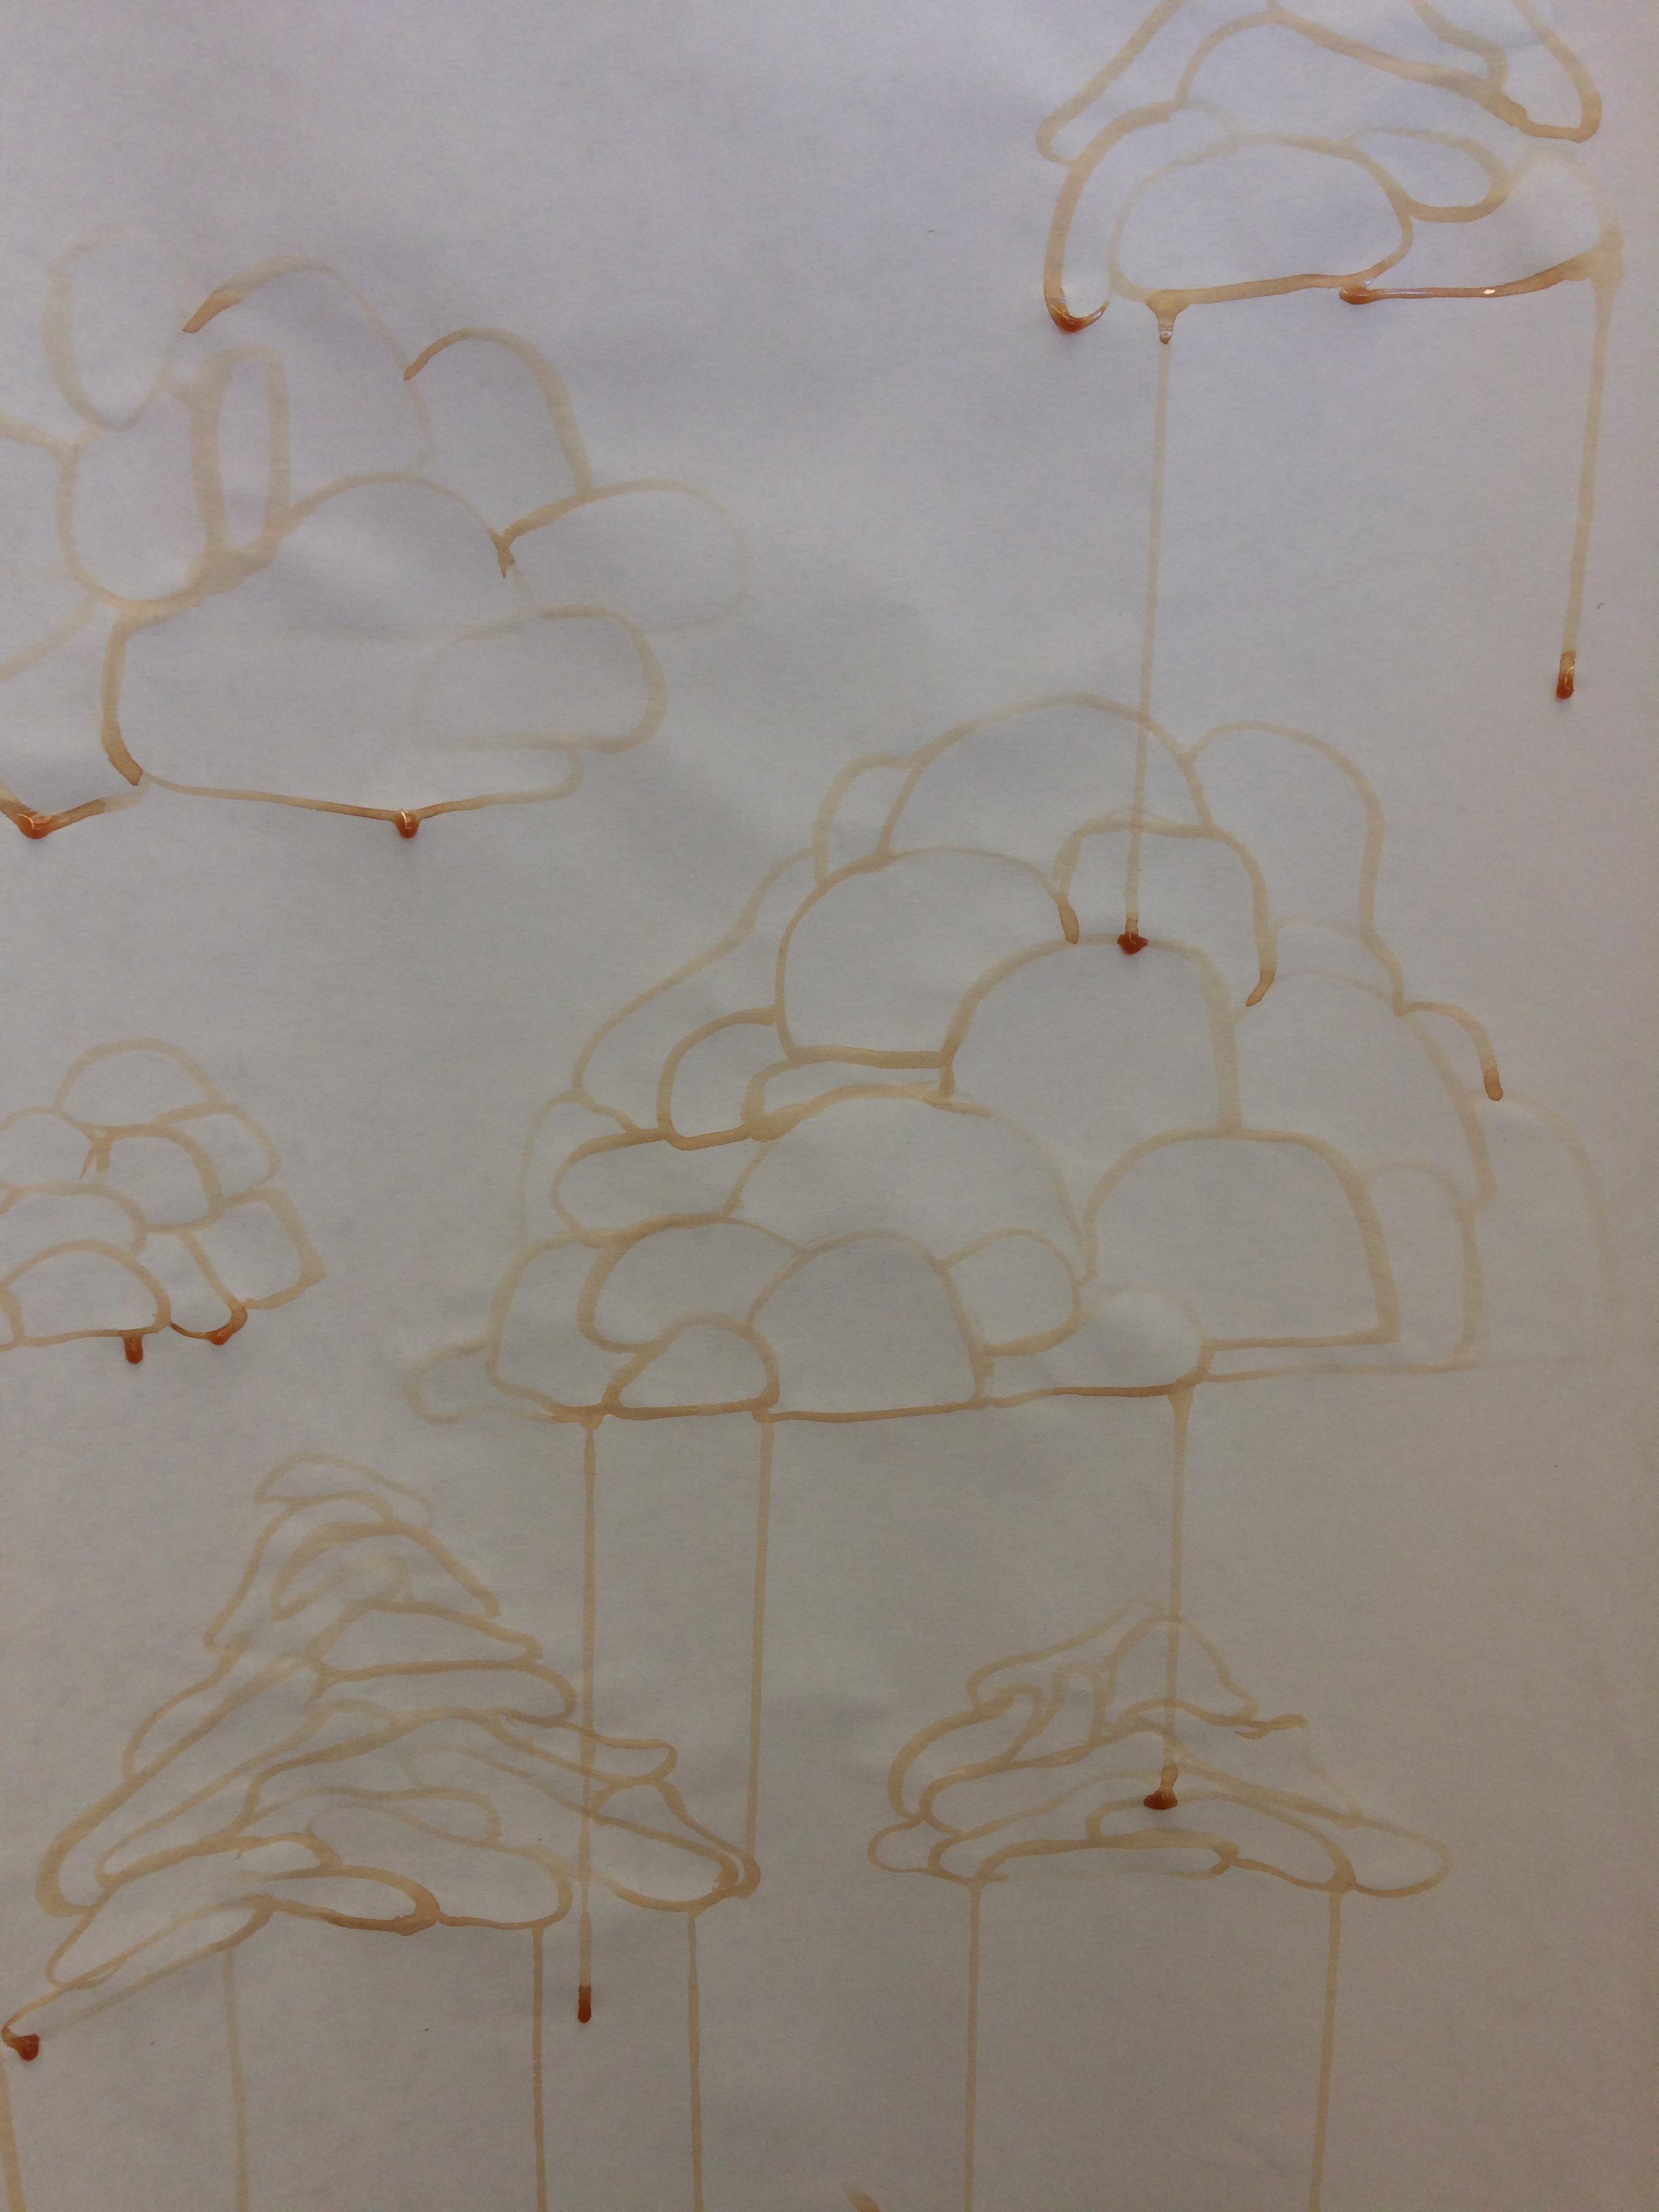 clouds, blobs, piles.